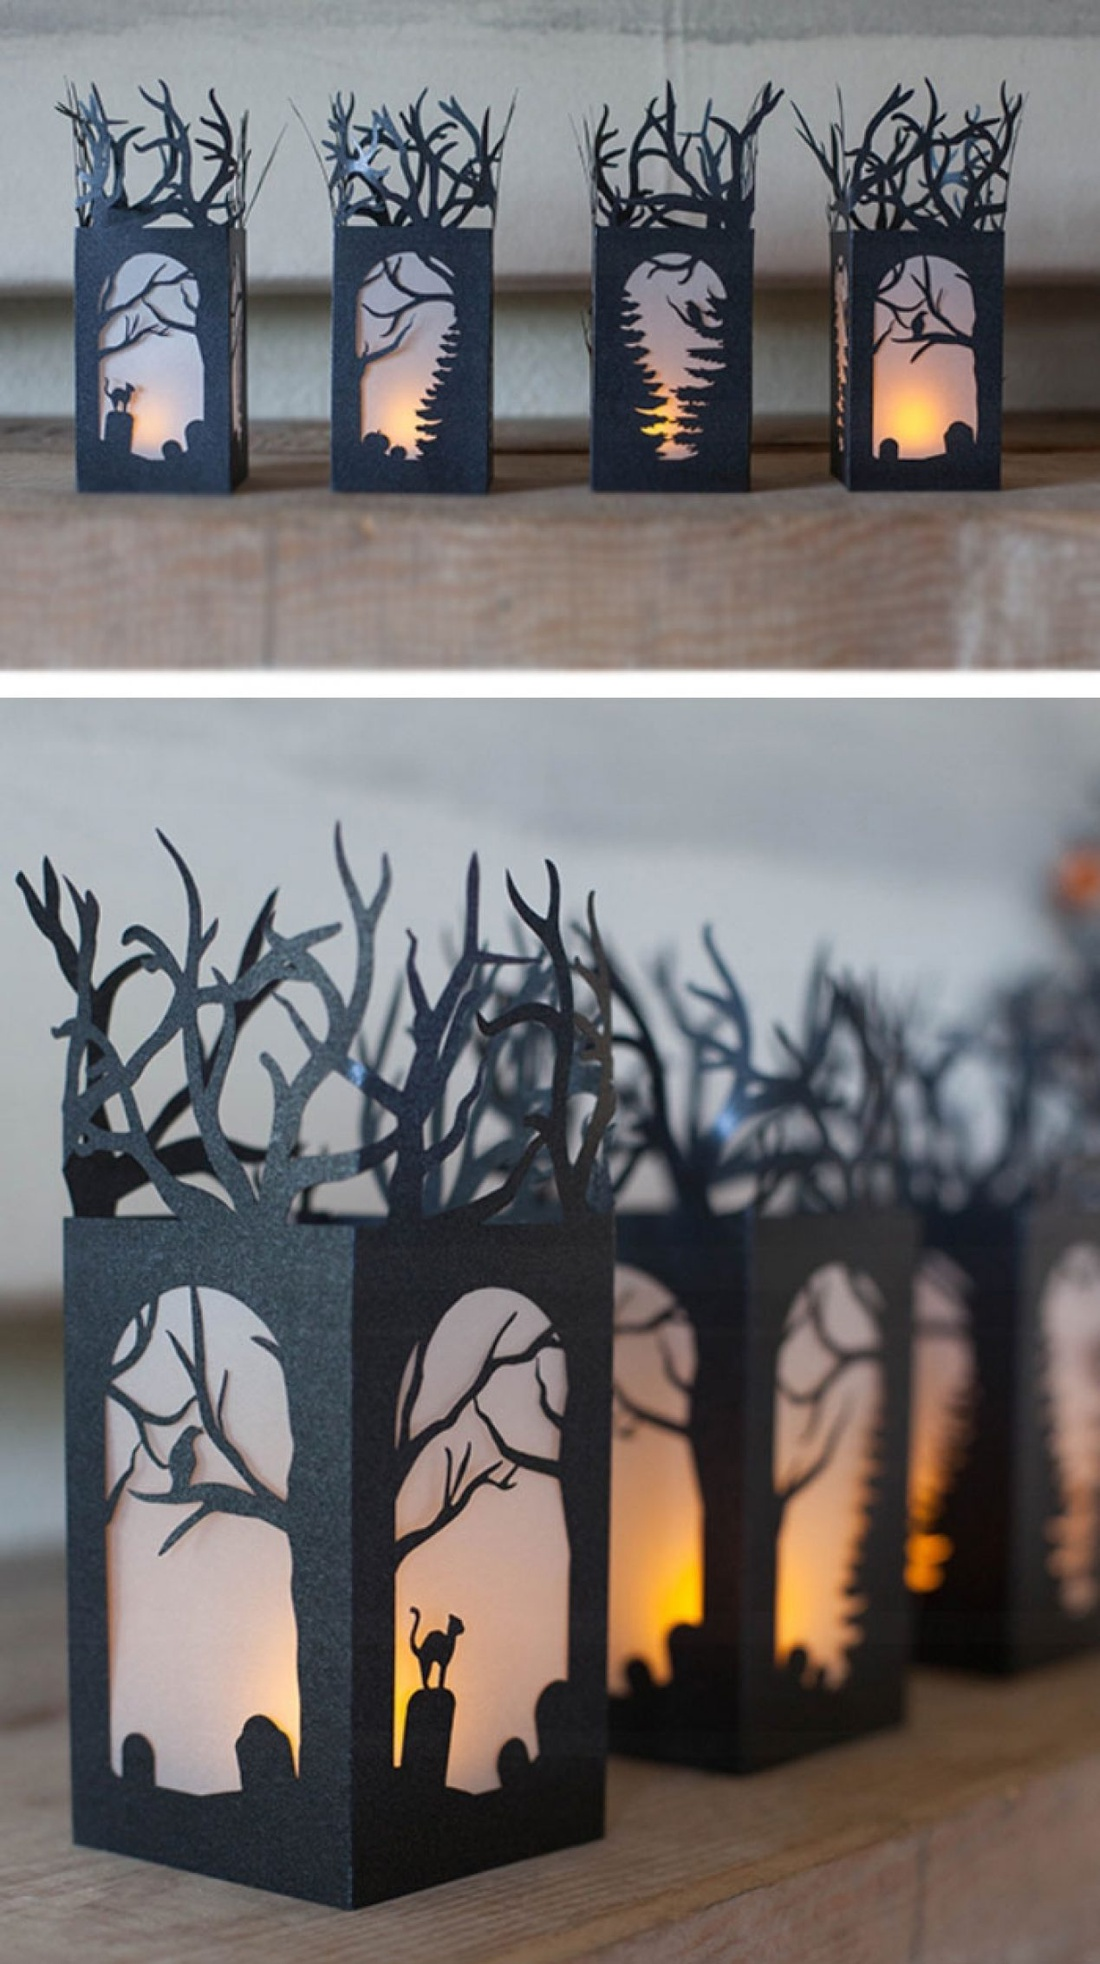 Светильник на Хеллоуин своими руками